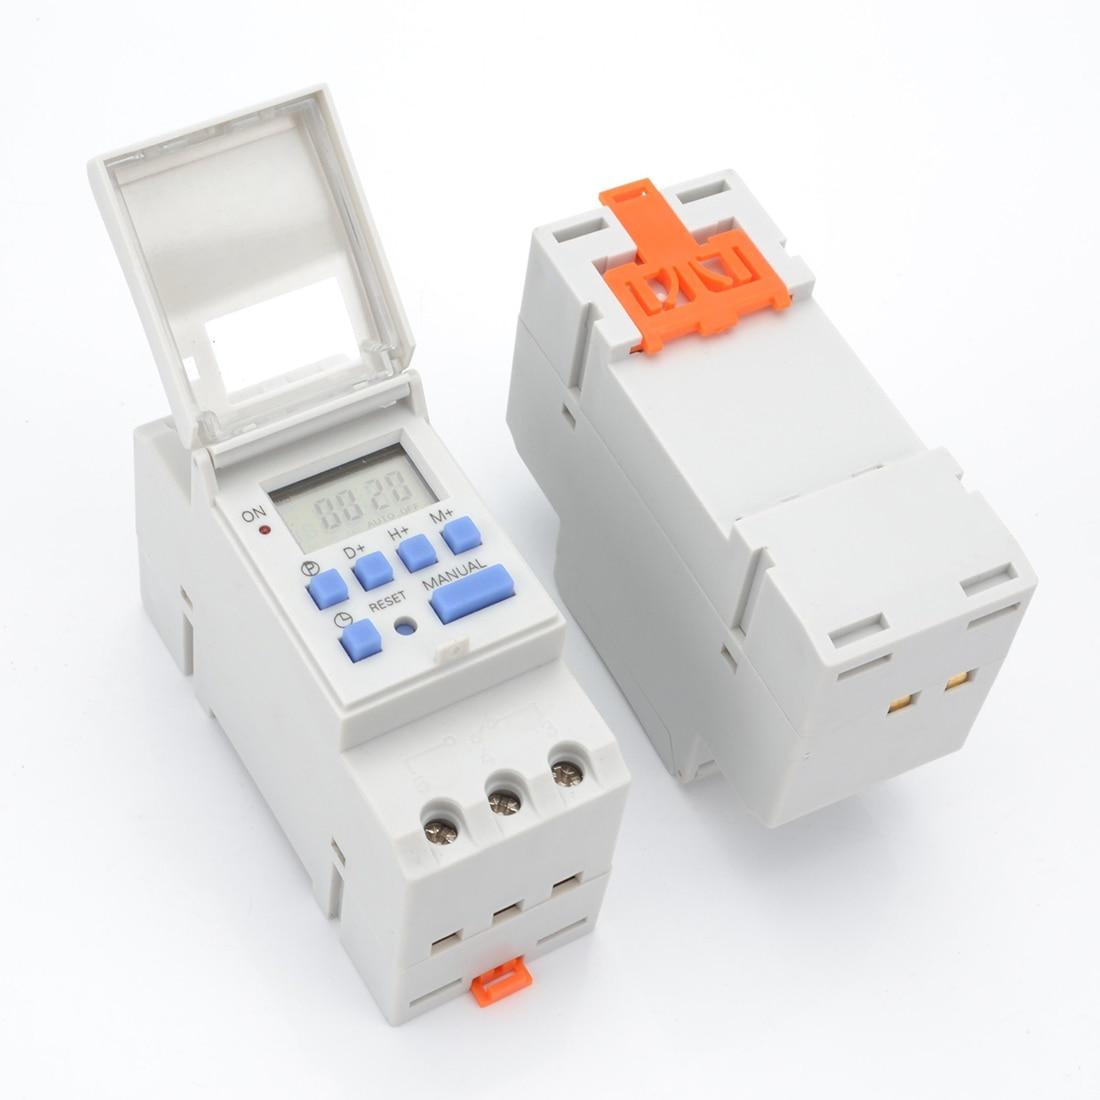 Digital LCD Timer Switch Power Timer Programmable Time Switch AC 220V / 110V  DC 12V 16A Temporizador Din Rail